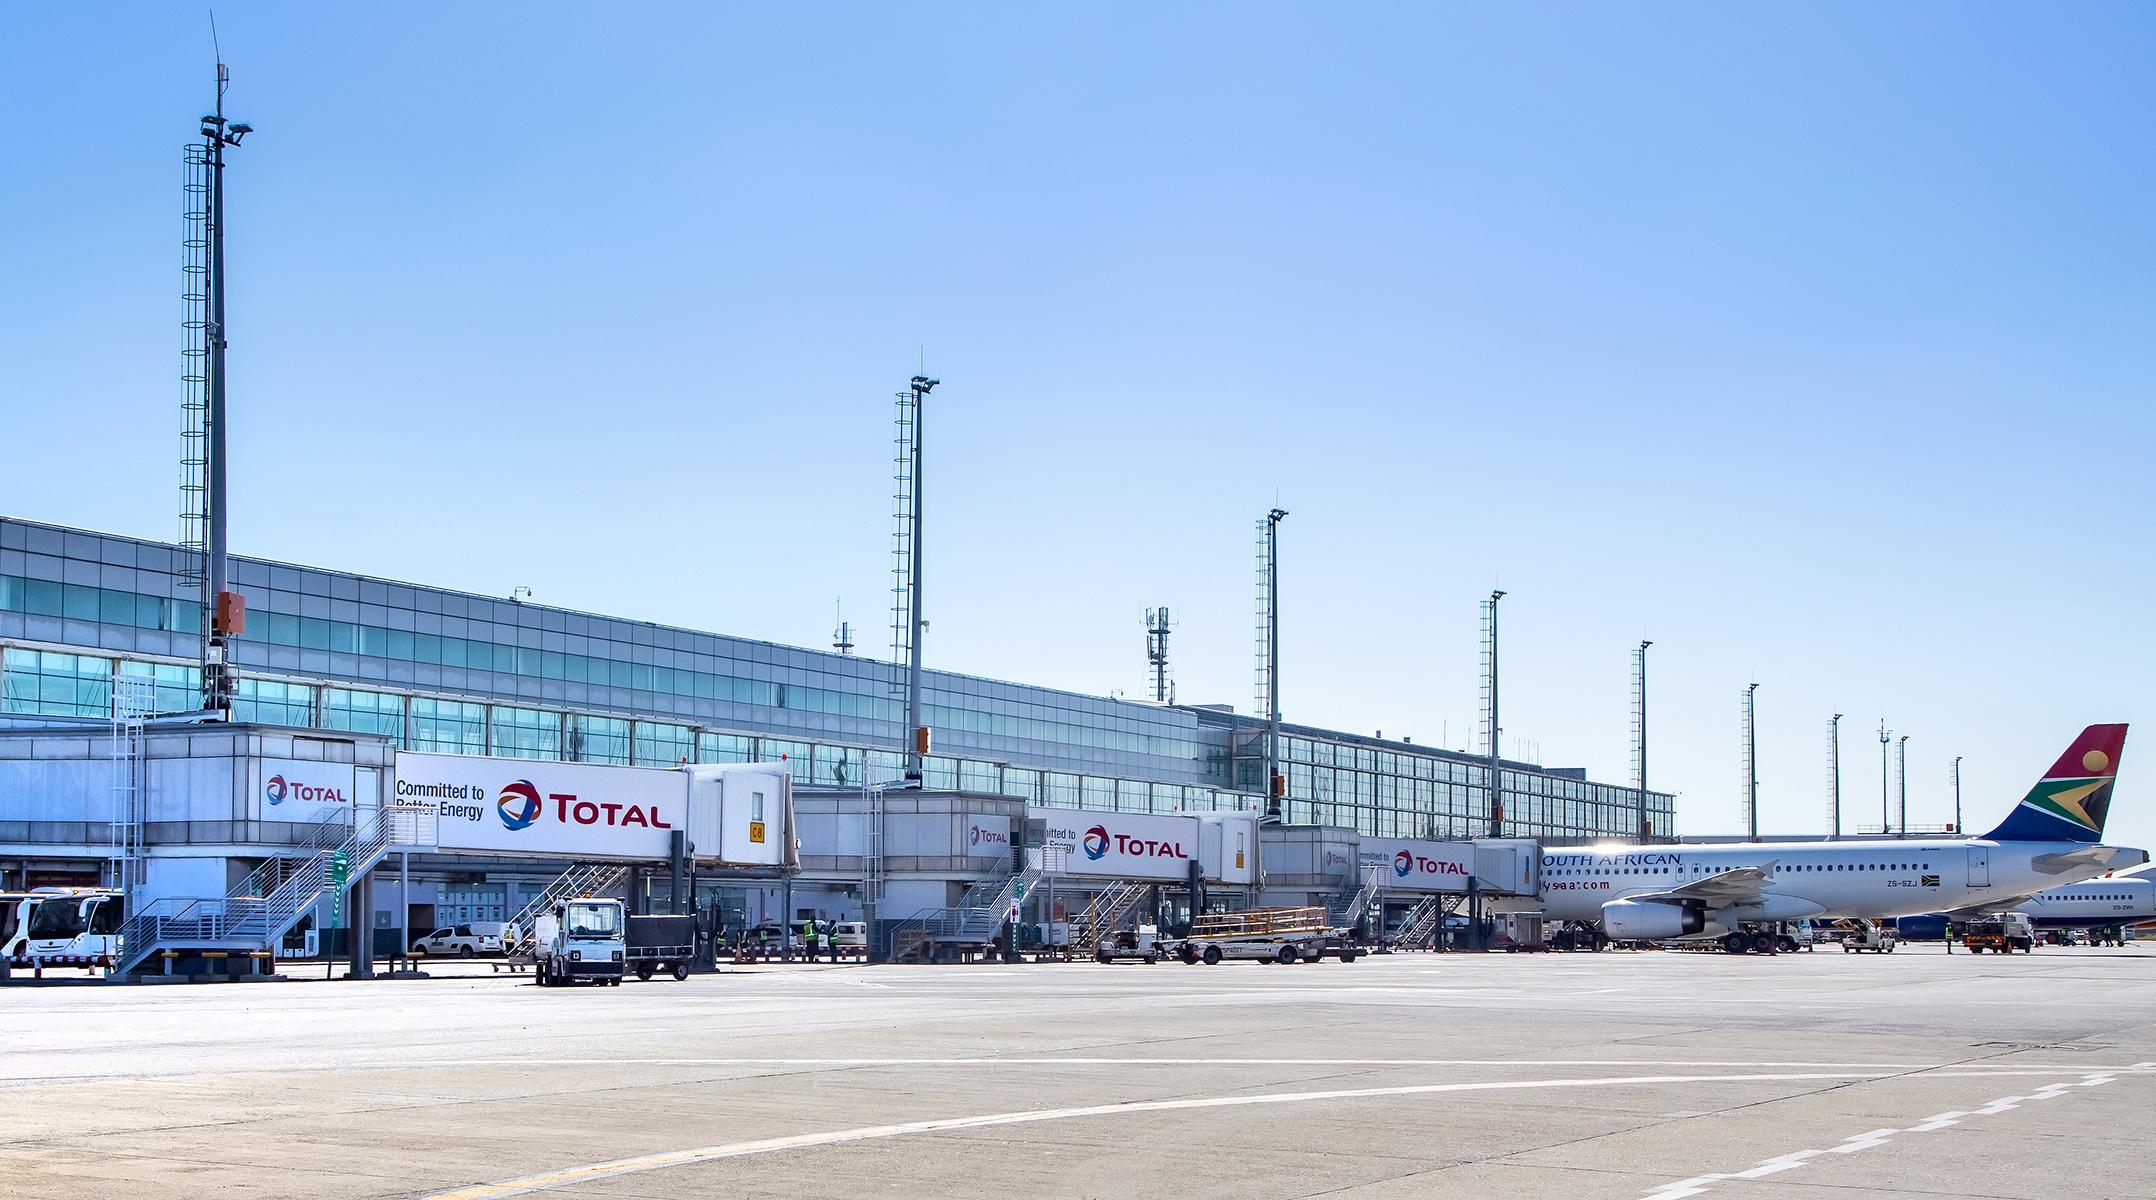 O. R. Tambo International Airport in Johannesburg